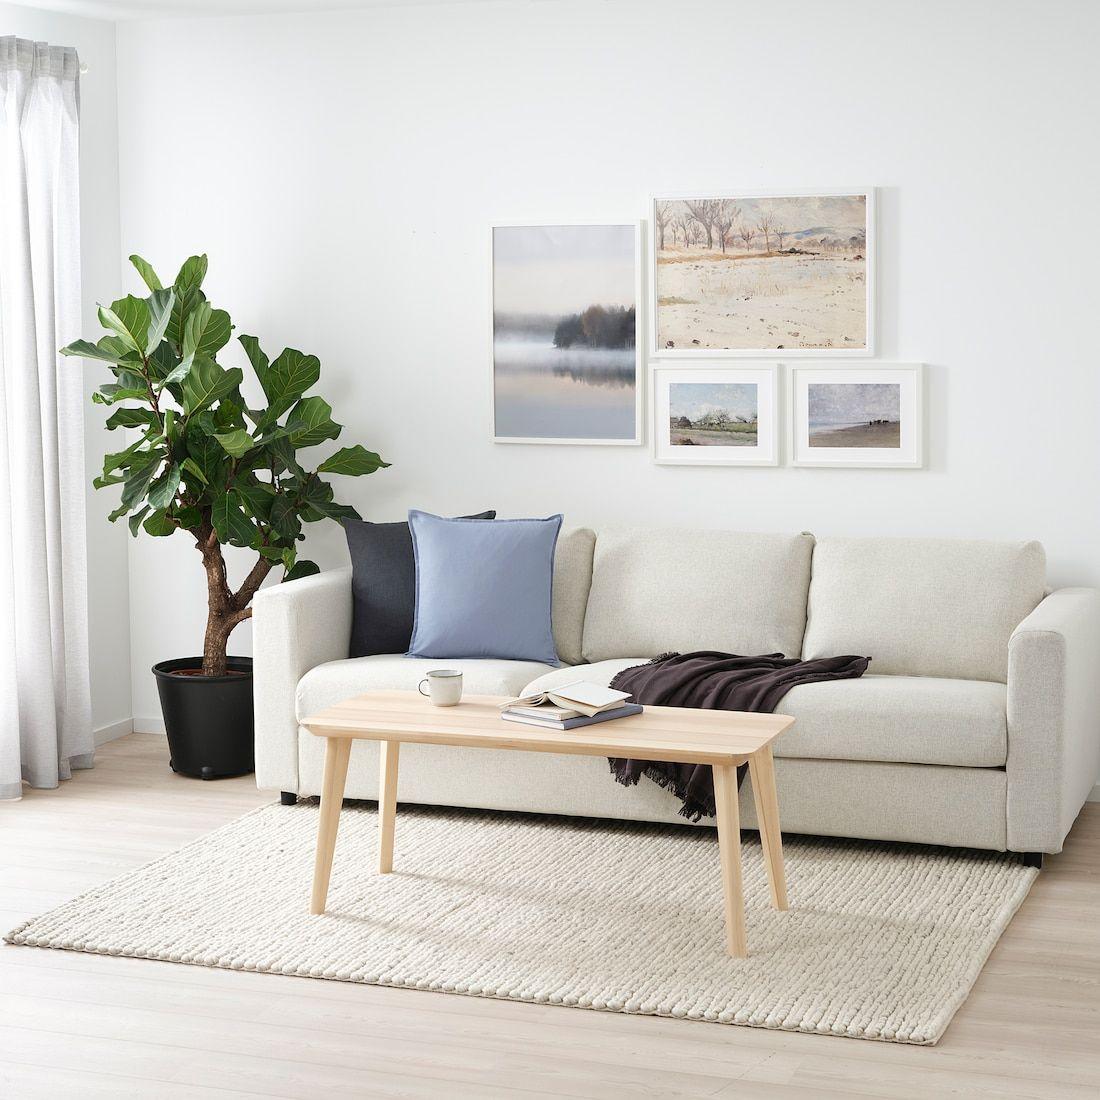 Hjortsvang Vloerkleed Handgemaakt Ecru 160x230 Cm Ikea In 2021 Ikea Area Rugs Ikea Rugs In Living Room [ 1100 x 1100 Pixel ]